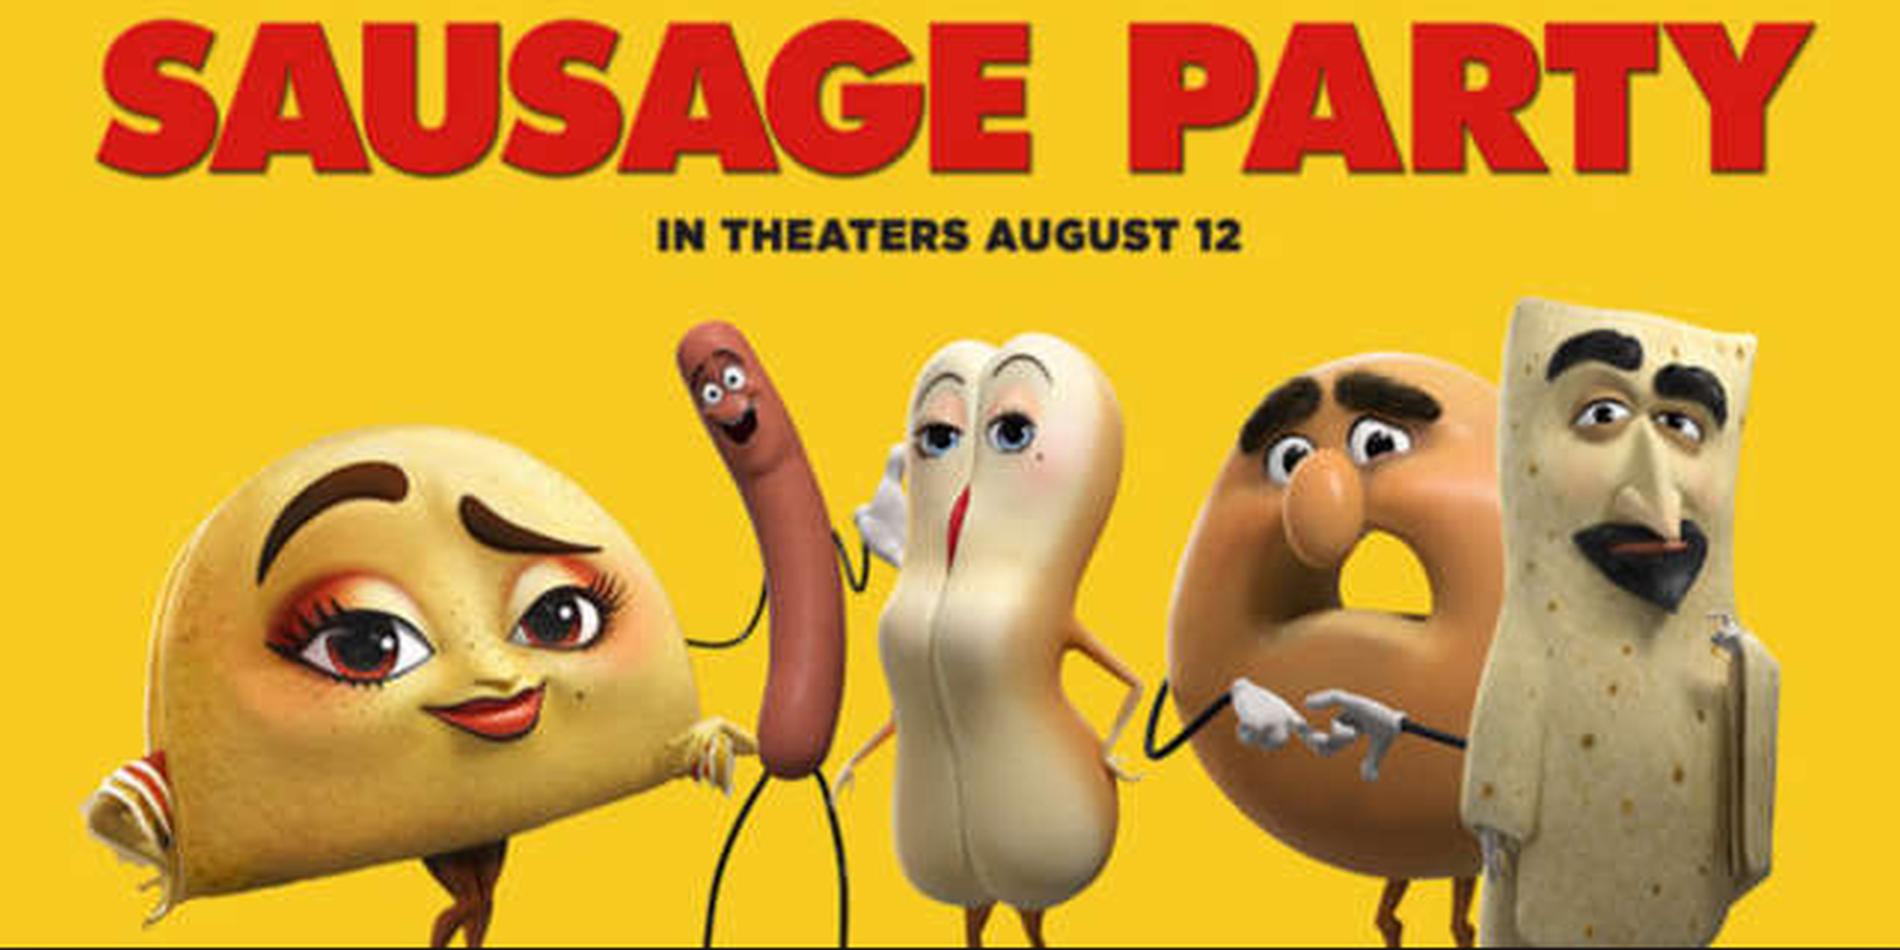 sausage party full movie online stream